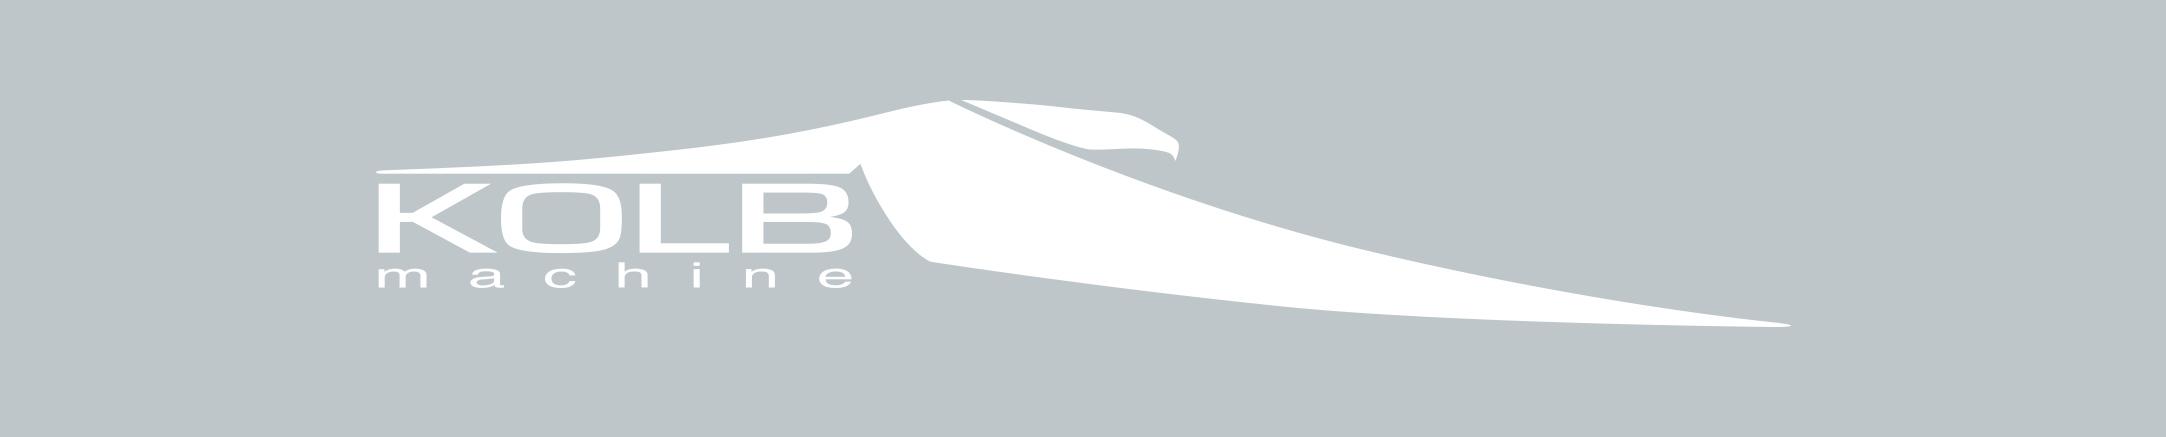 homepage-logo.jpg